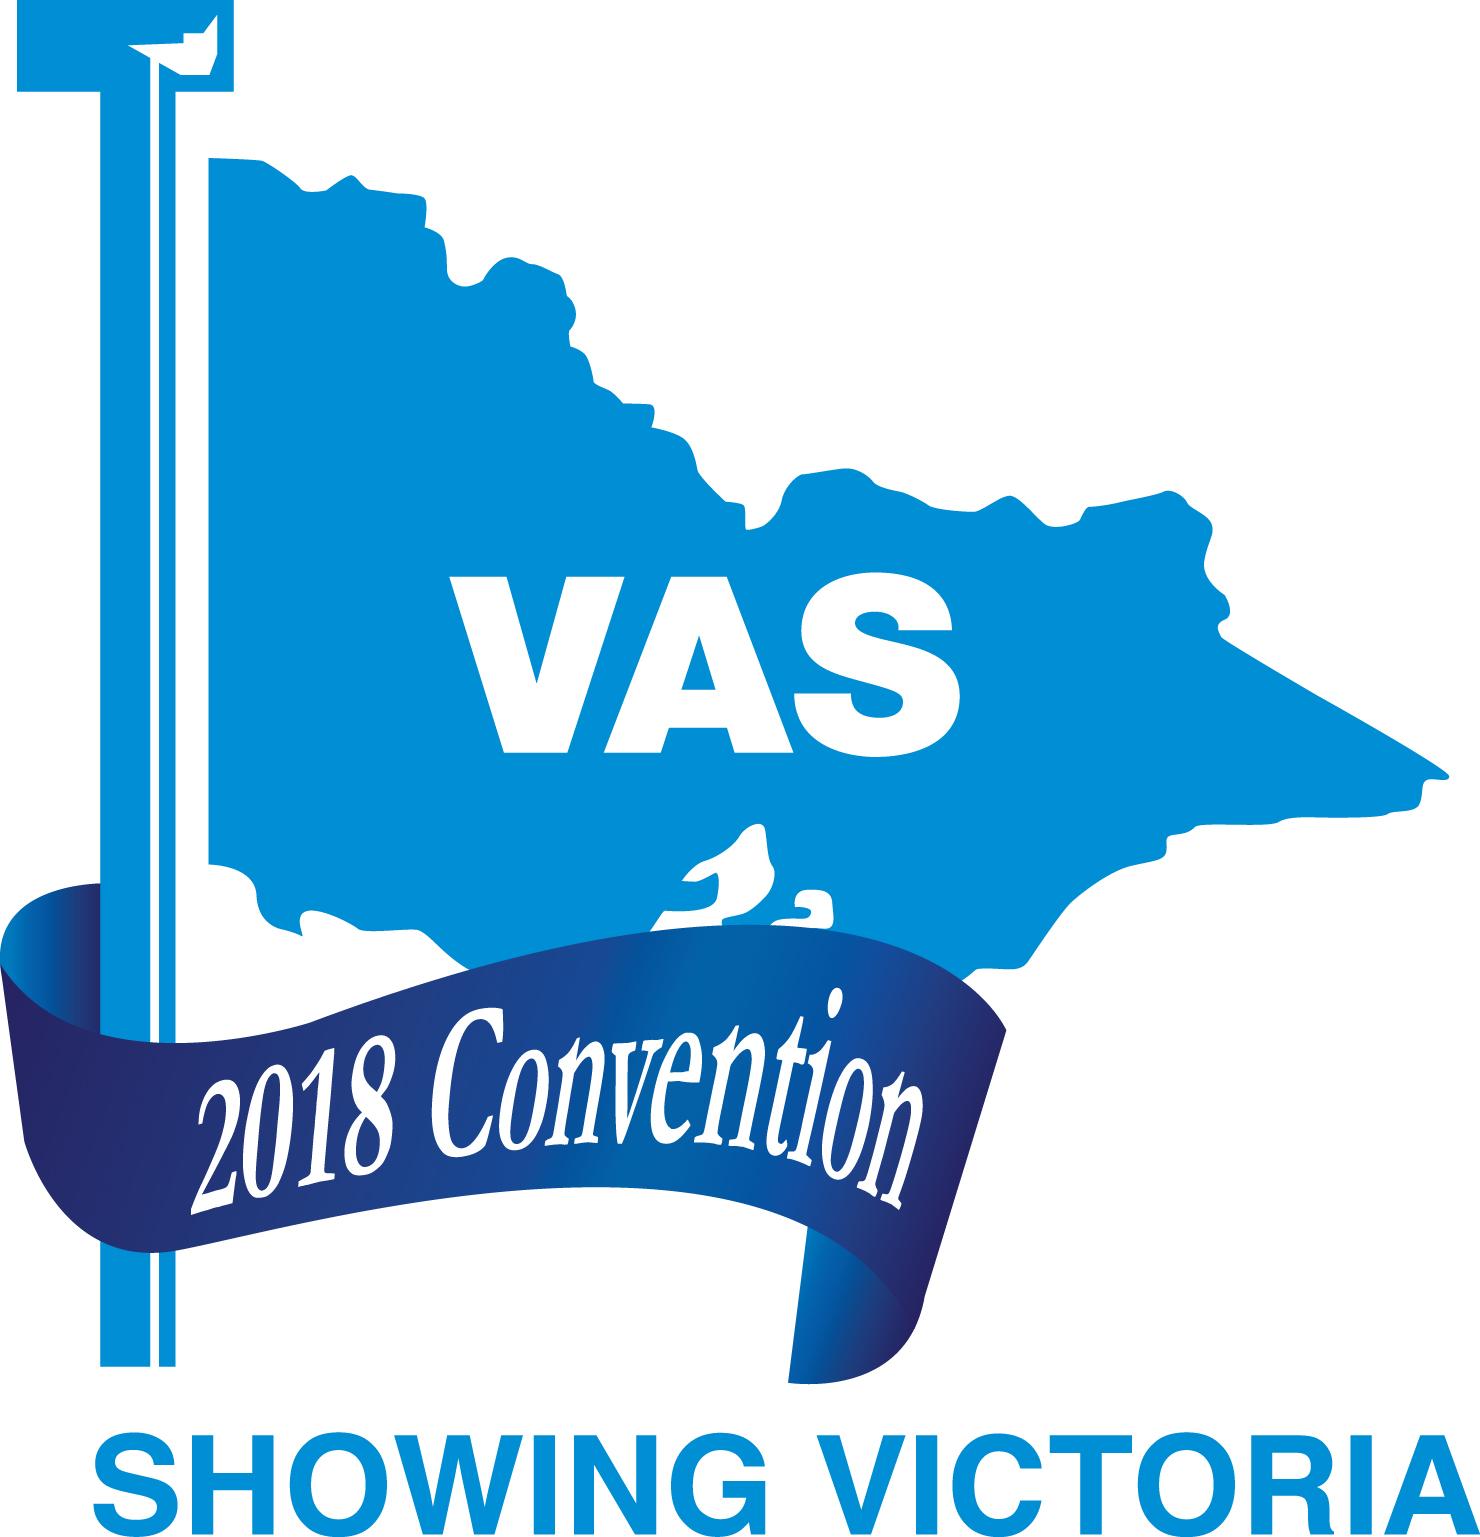 VAS LOGO 2018 Convention.jpg